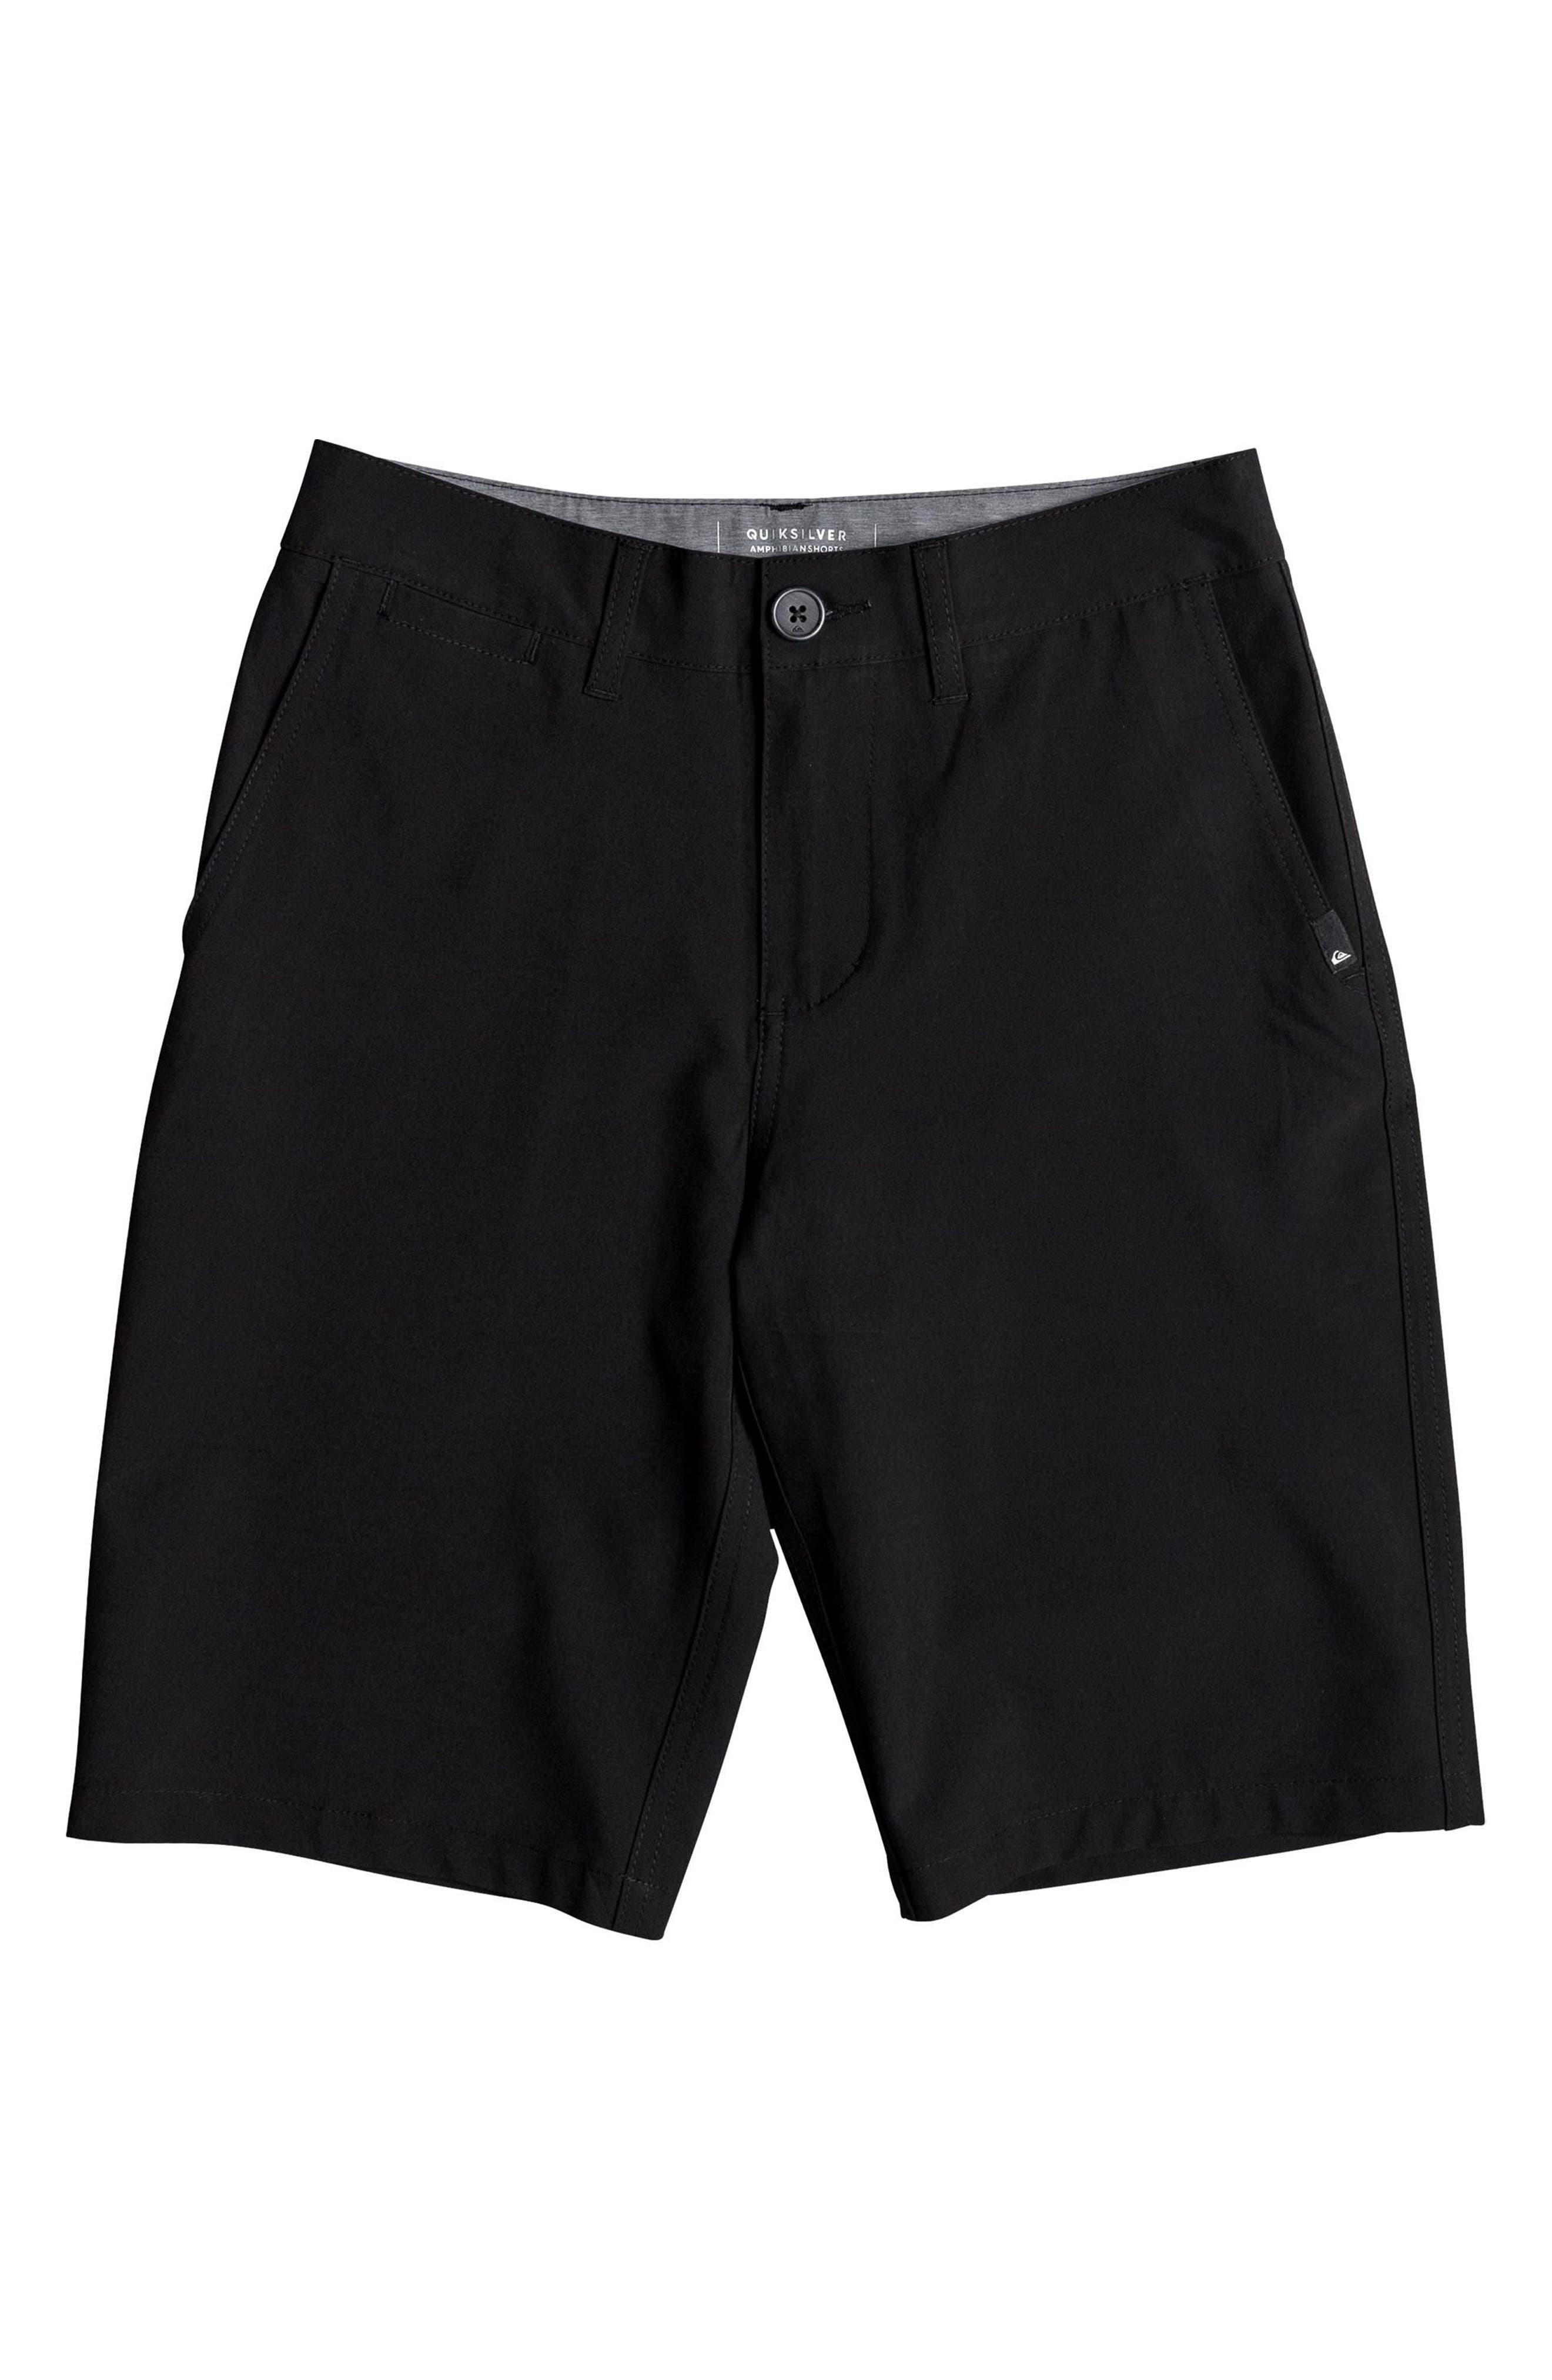 Union Amphibian Hybrid Shorts,                         Main,                         color, 002